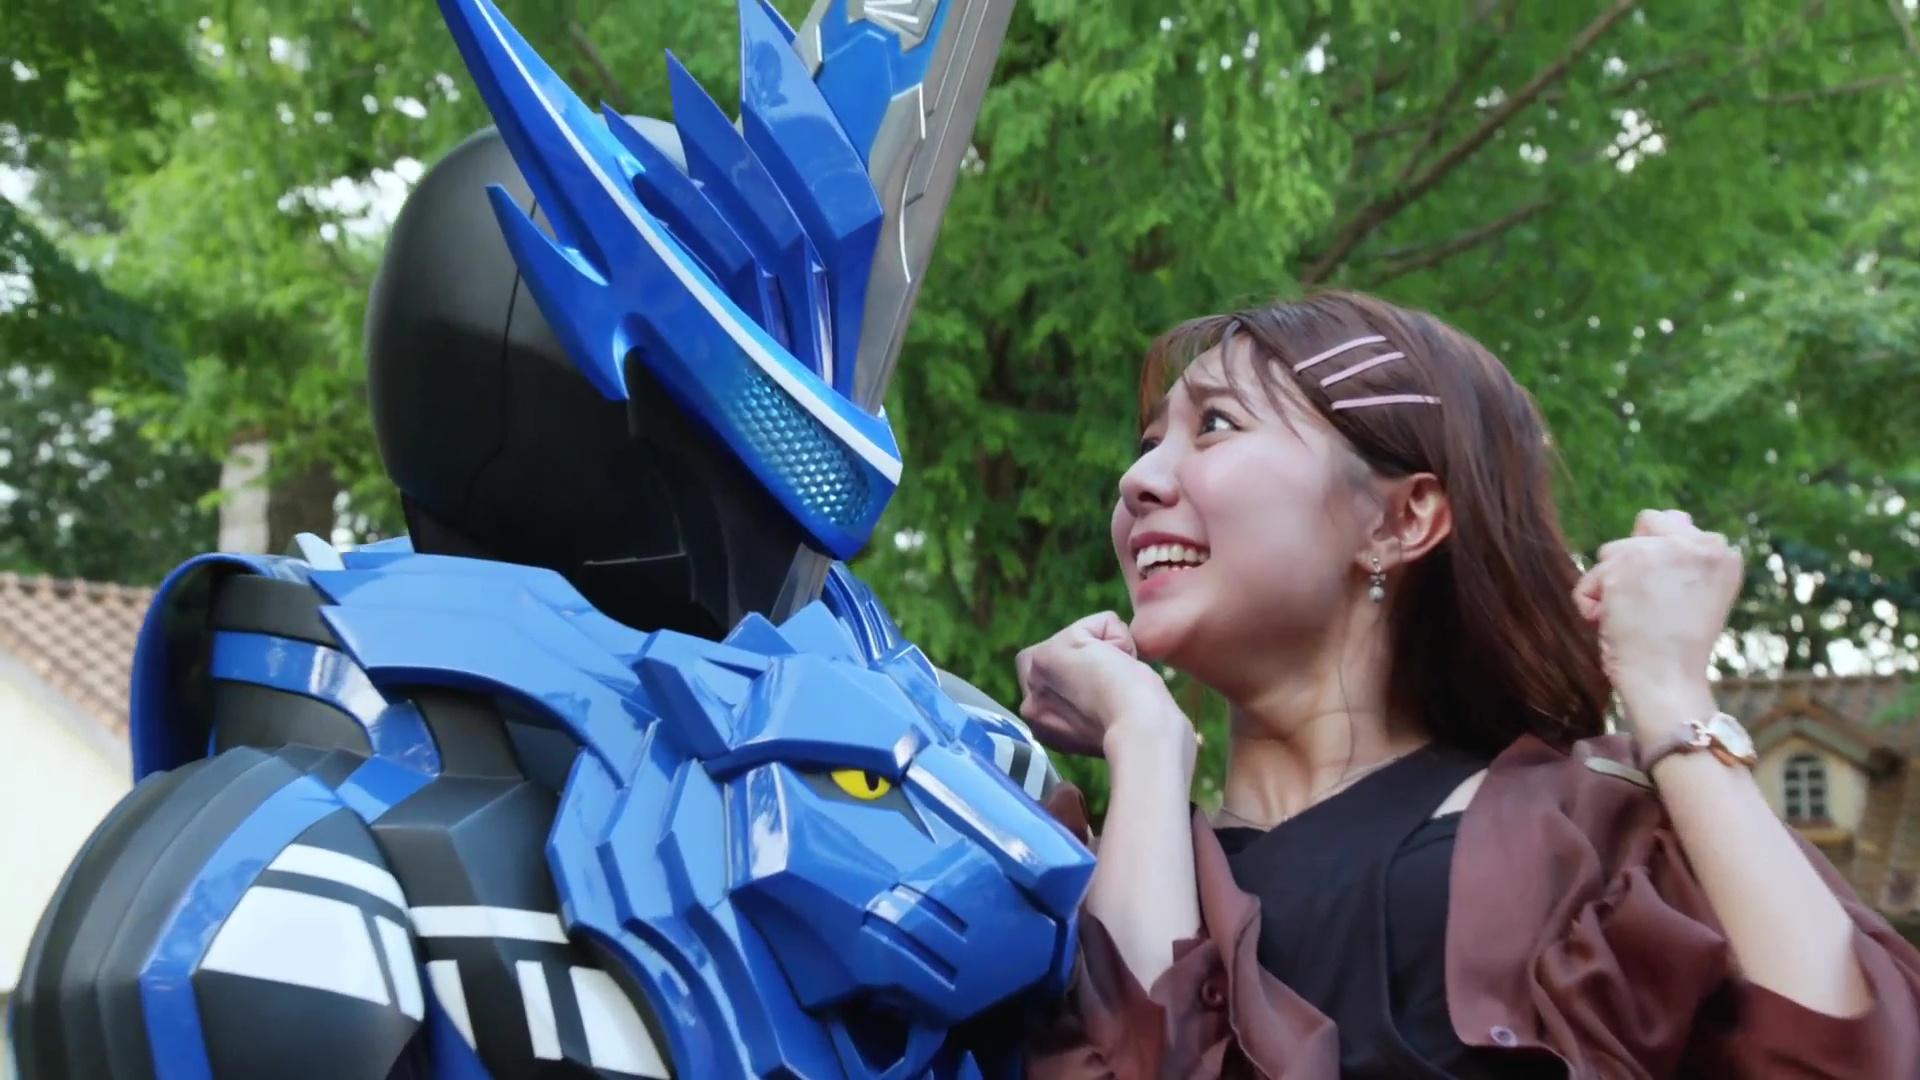 Kamen Rider Saber Episode 7 Recap